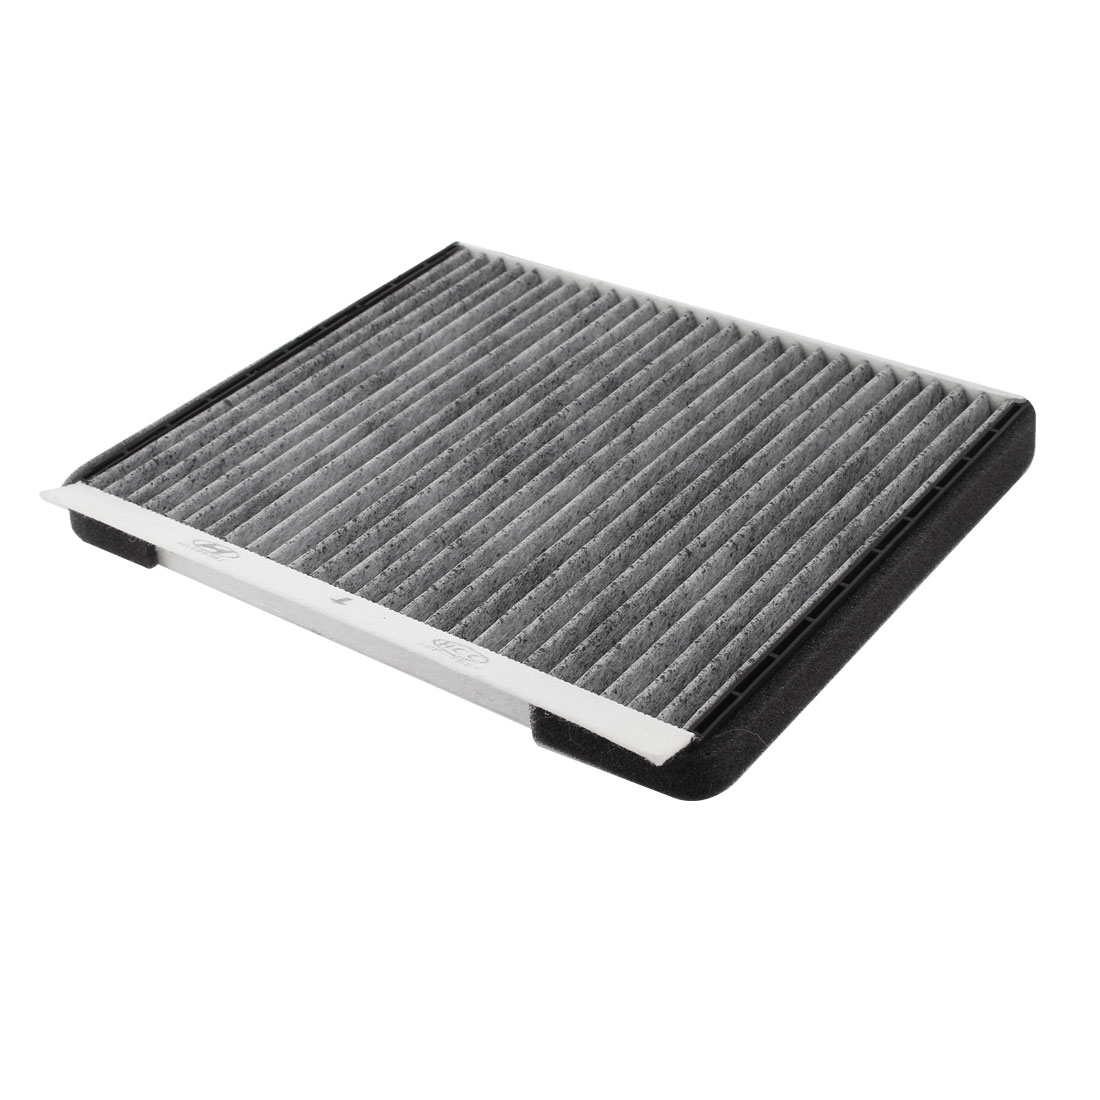 97133-1E000 Active Carbon Fiber A/C Cabin Air Filter for 2005-2006 Accent